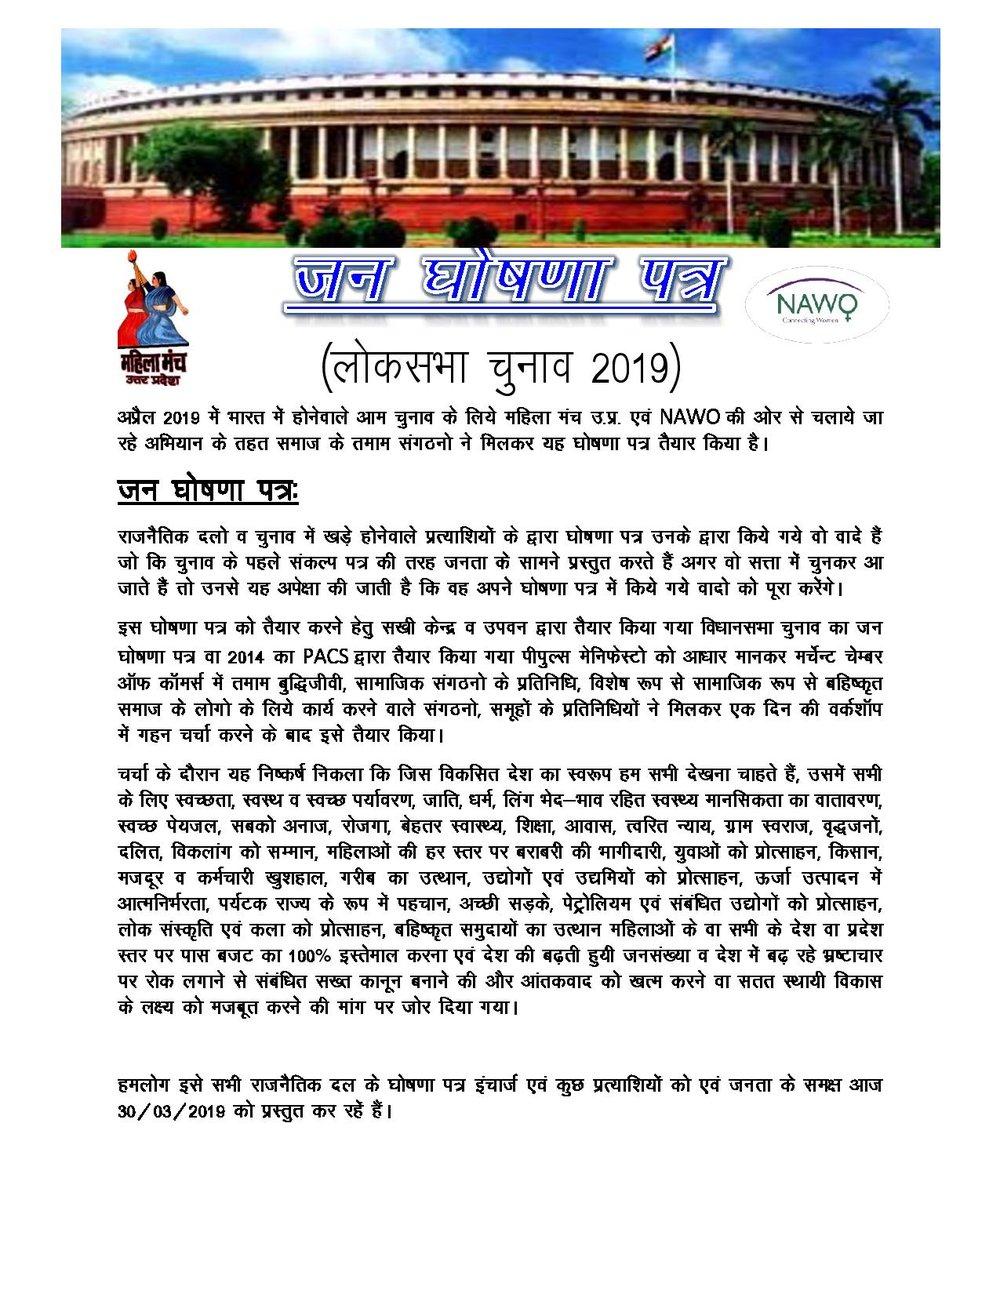 People Manifesto 2019 (Mahila Manch & NAWO) local issues.docx-page-001.jpg